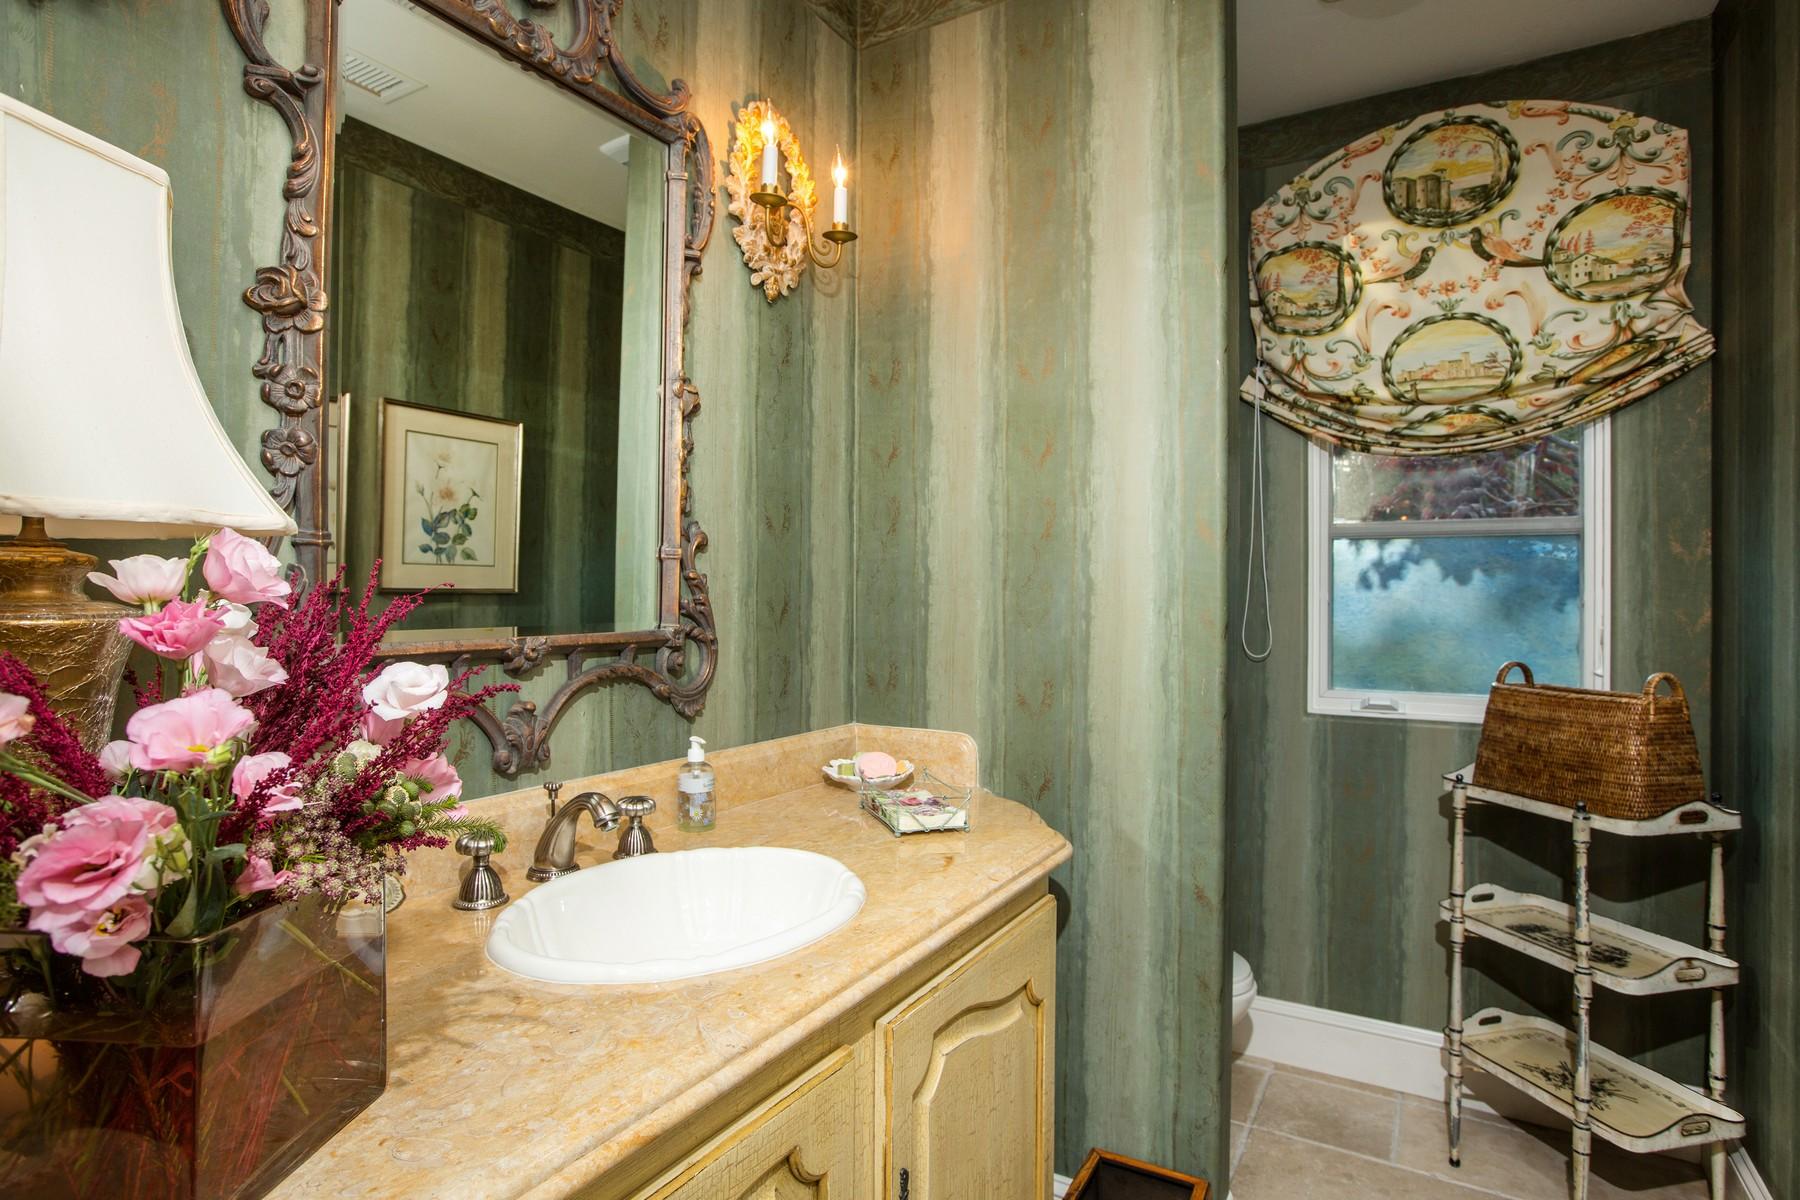 Additional photo for property listing at San Elijo 5546 San Elijo Rancho Santa Fe, Калифорния 92067 Соединенные Штаты